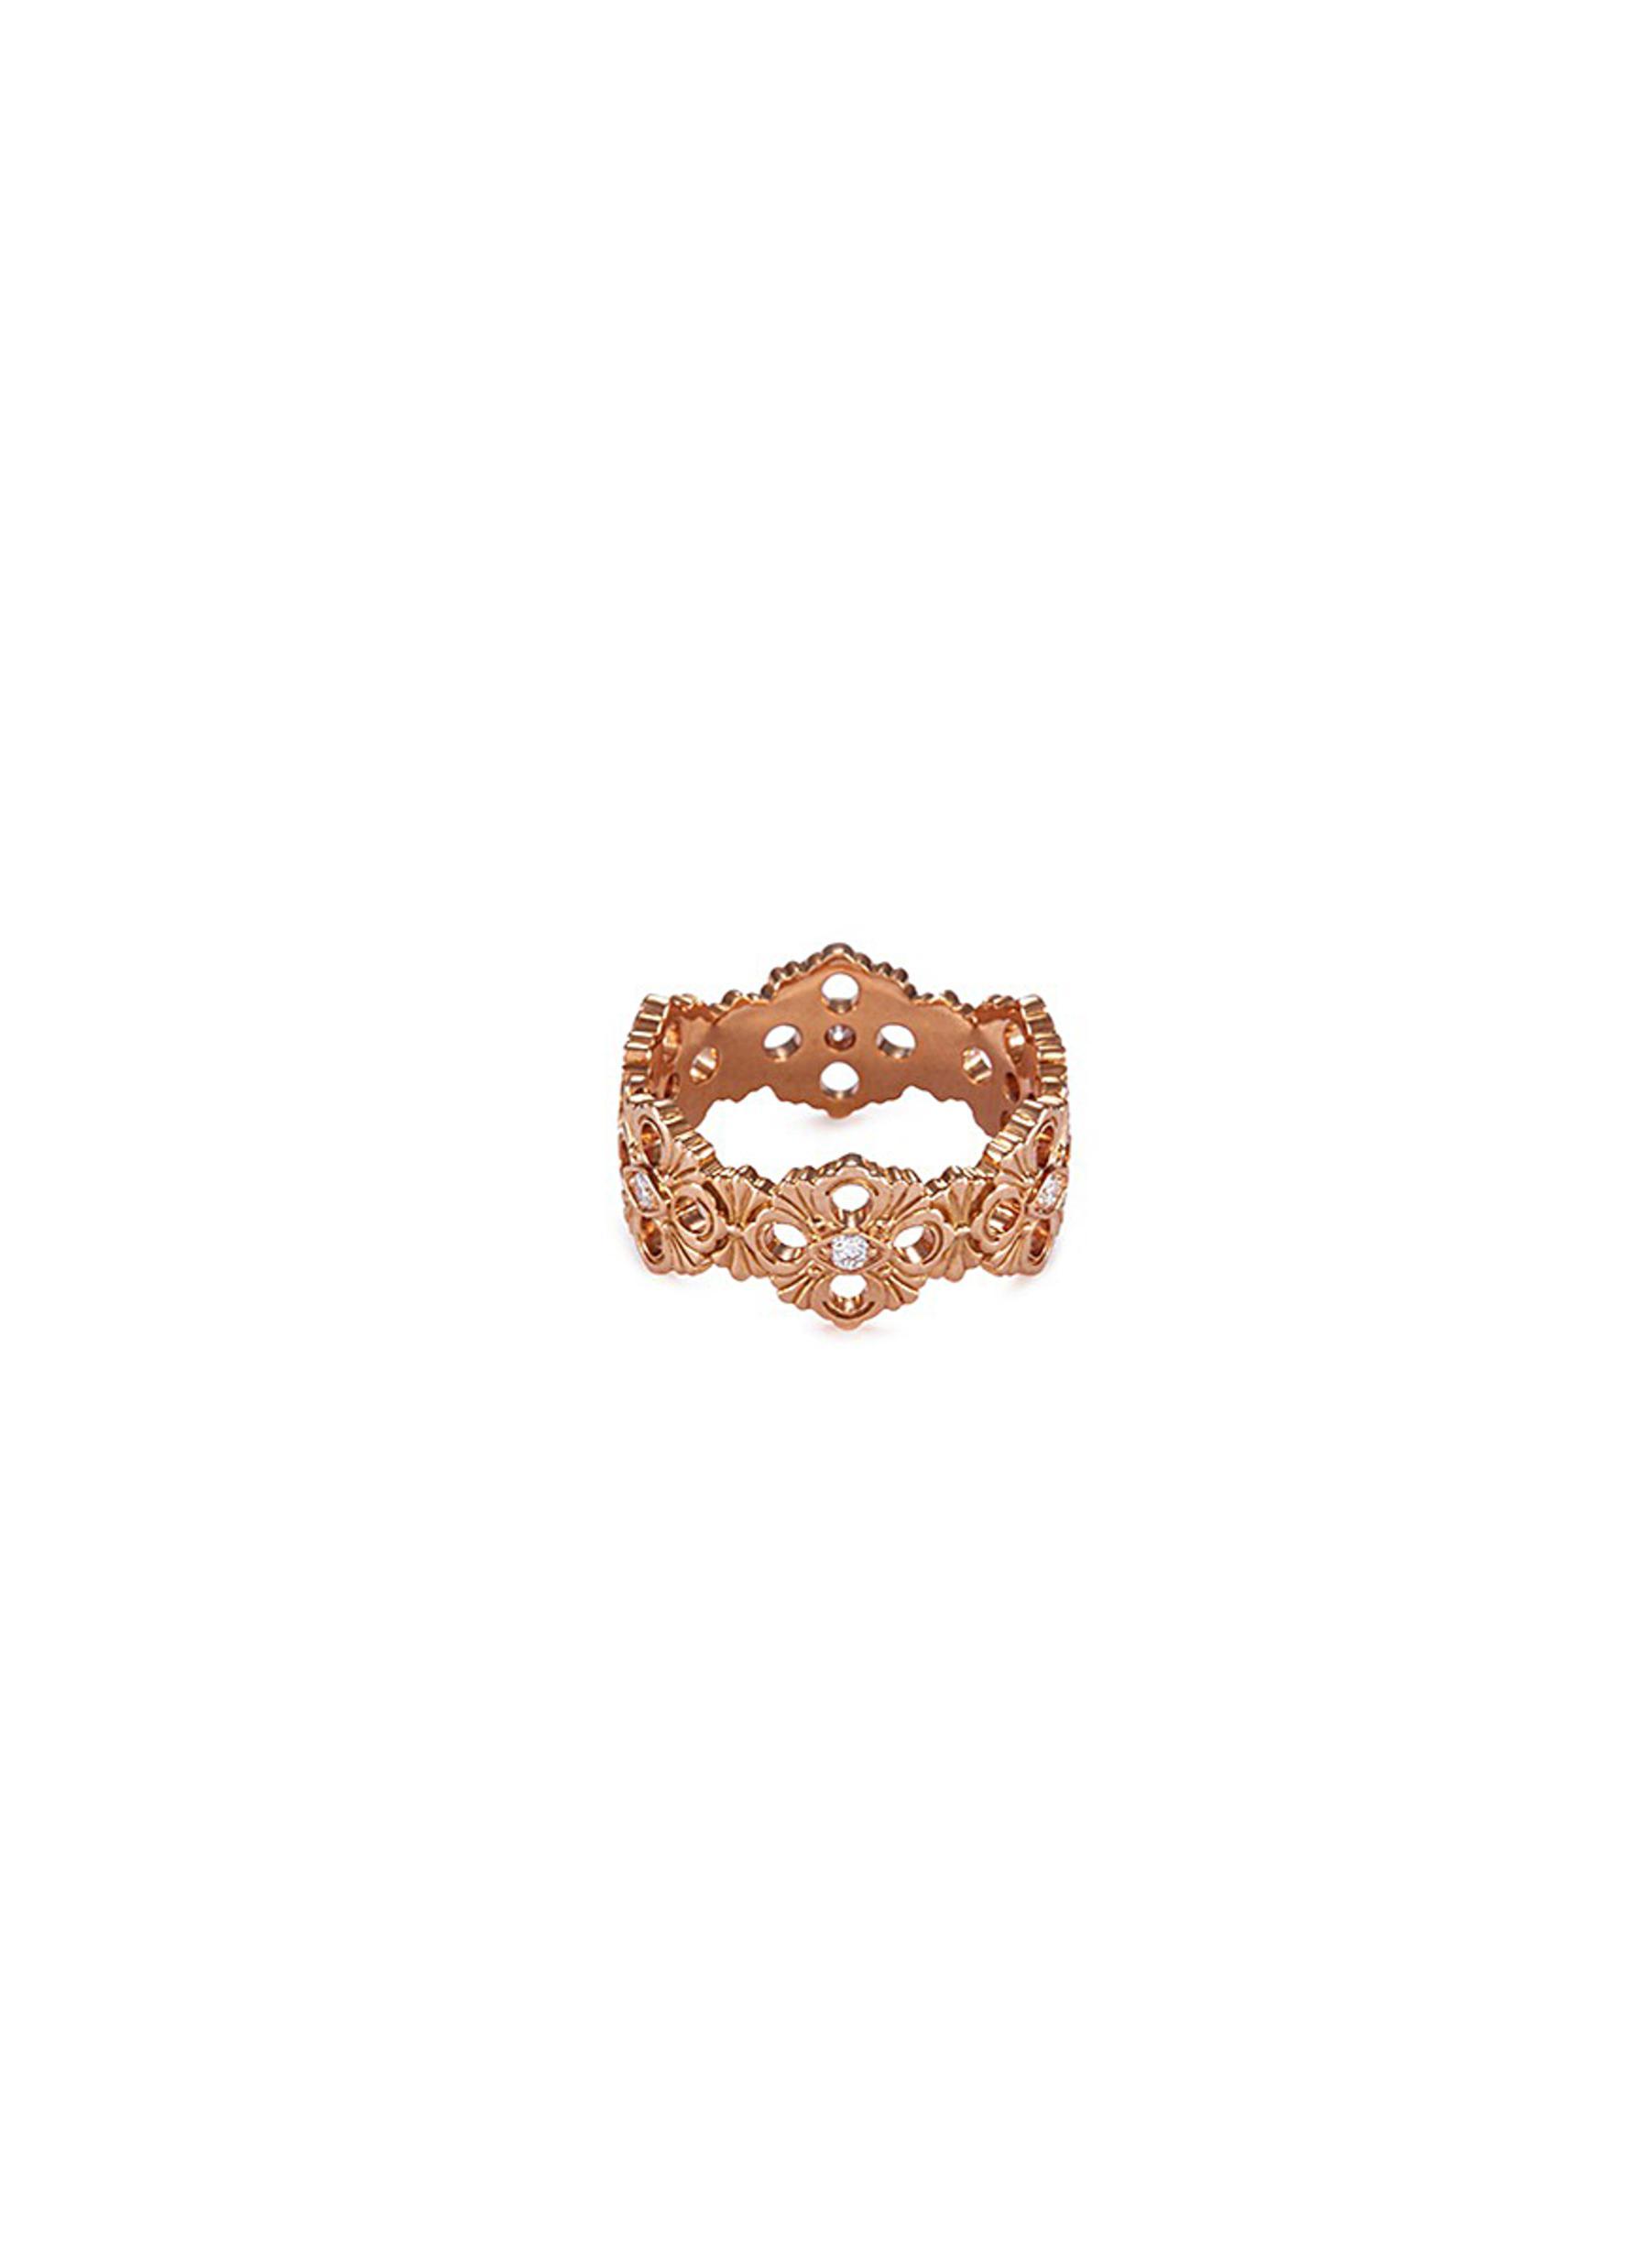 'Opera' diamond 18k rose gold ring